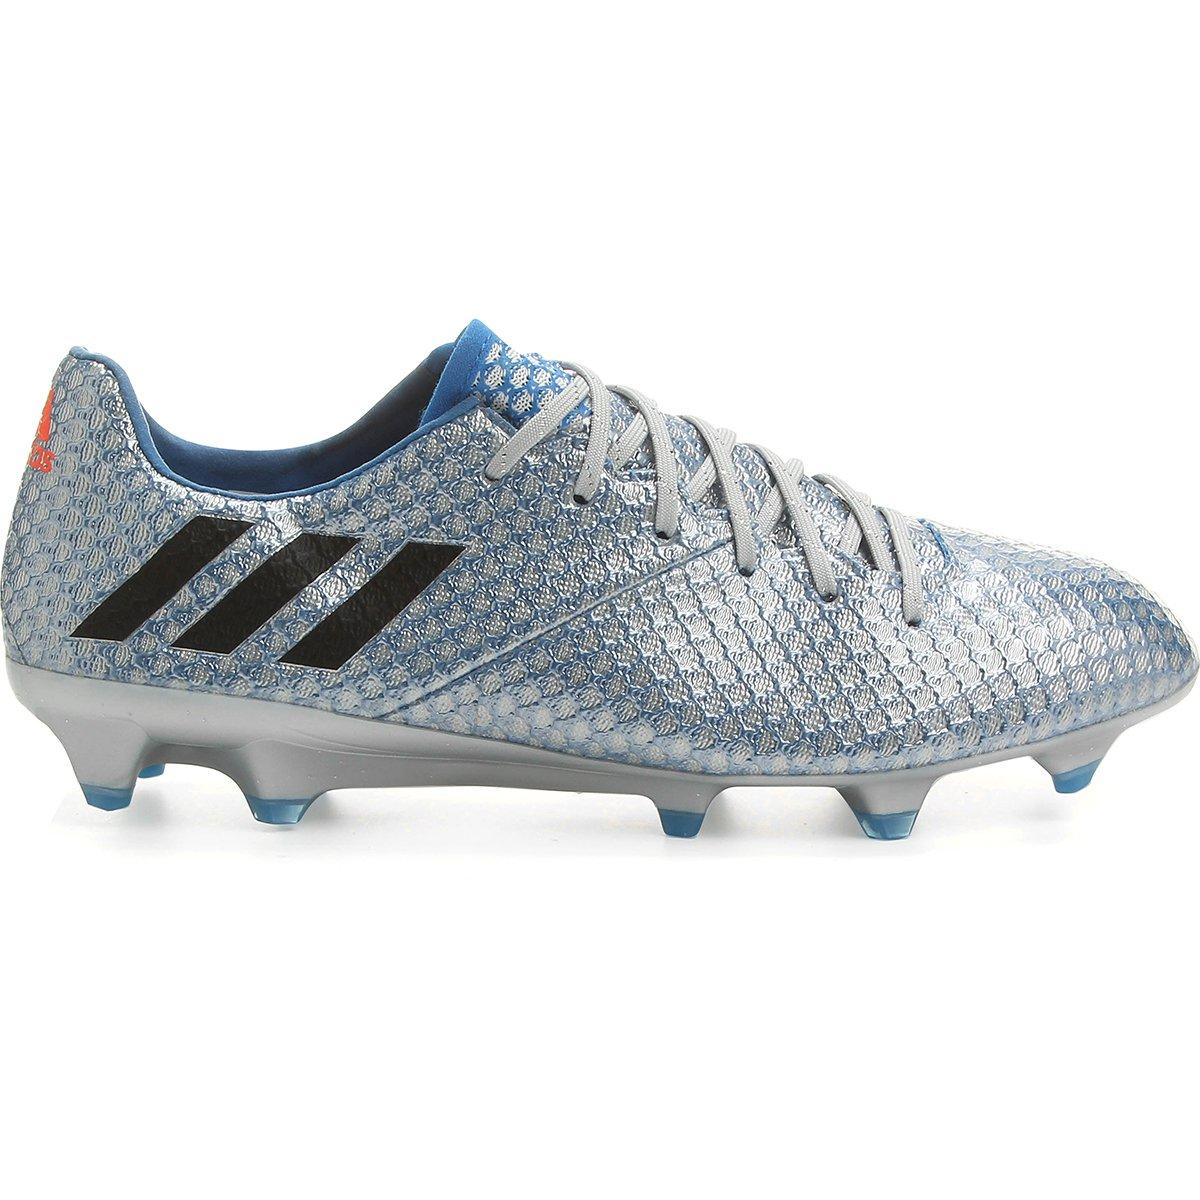 f74ddfffde Chuteira Campo Adidas Messi 16.1 FG Masculina - Compre Agora